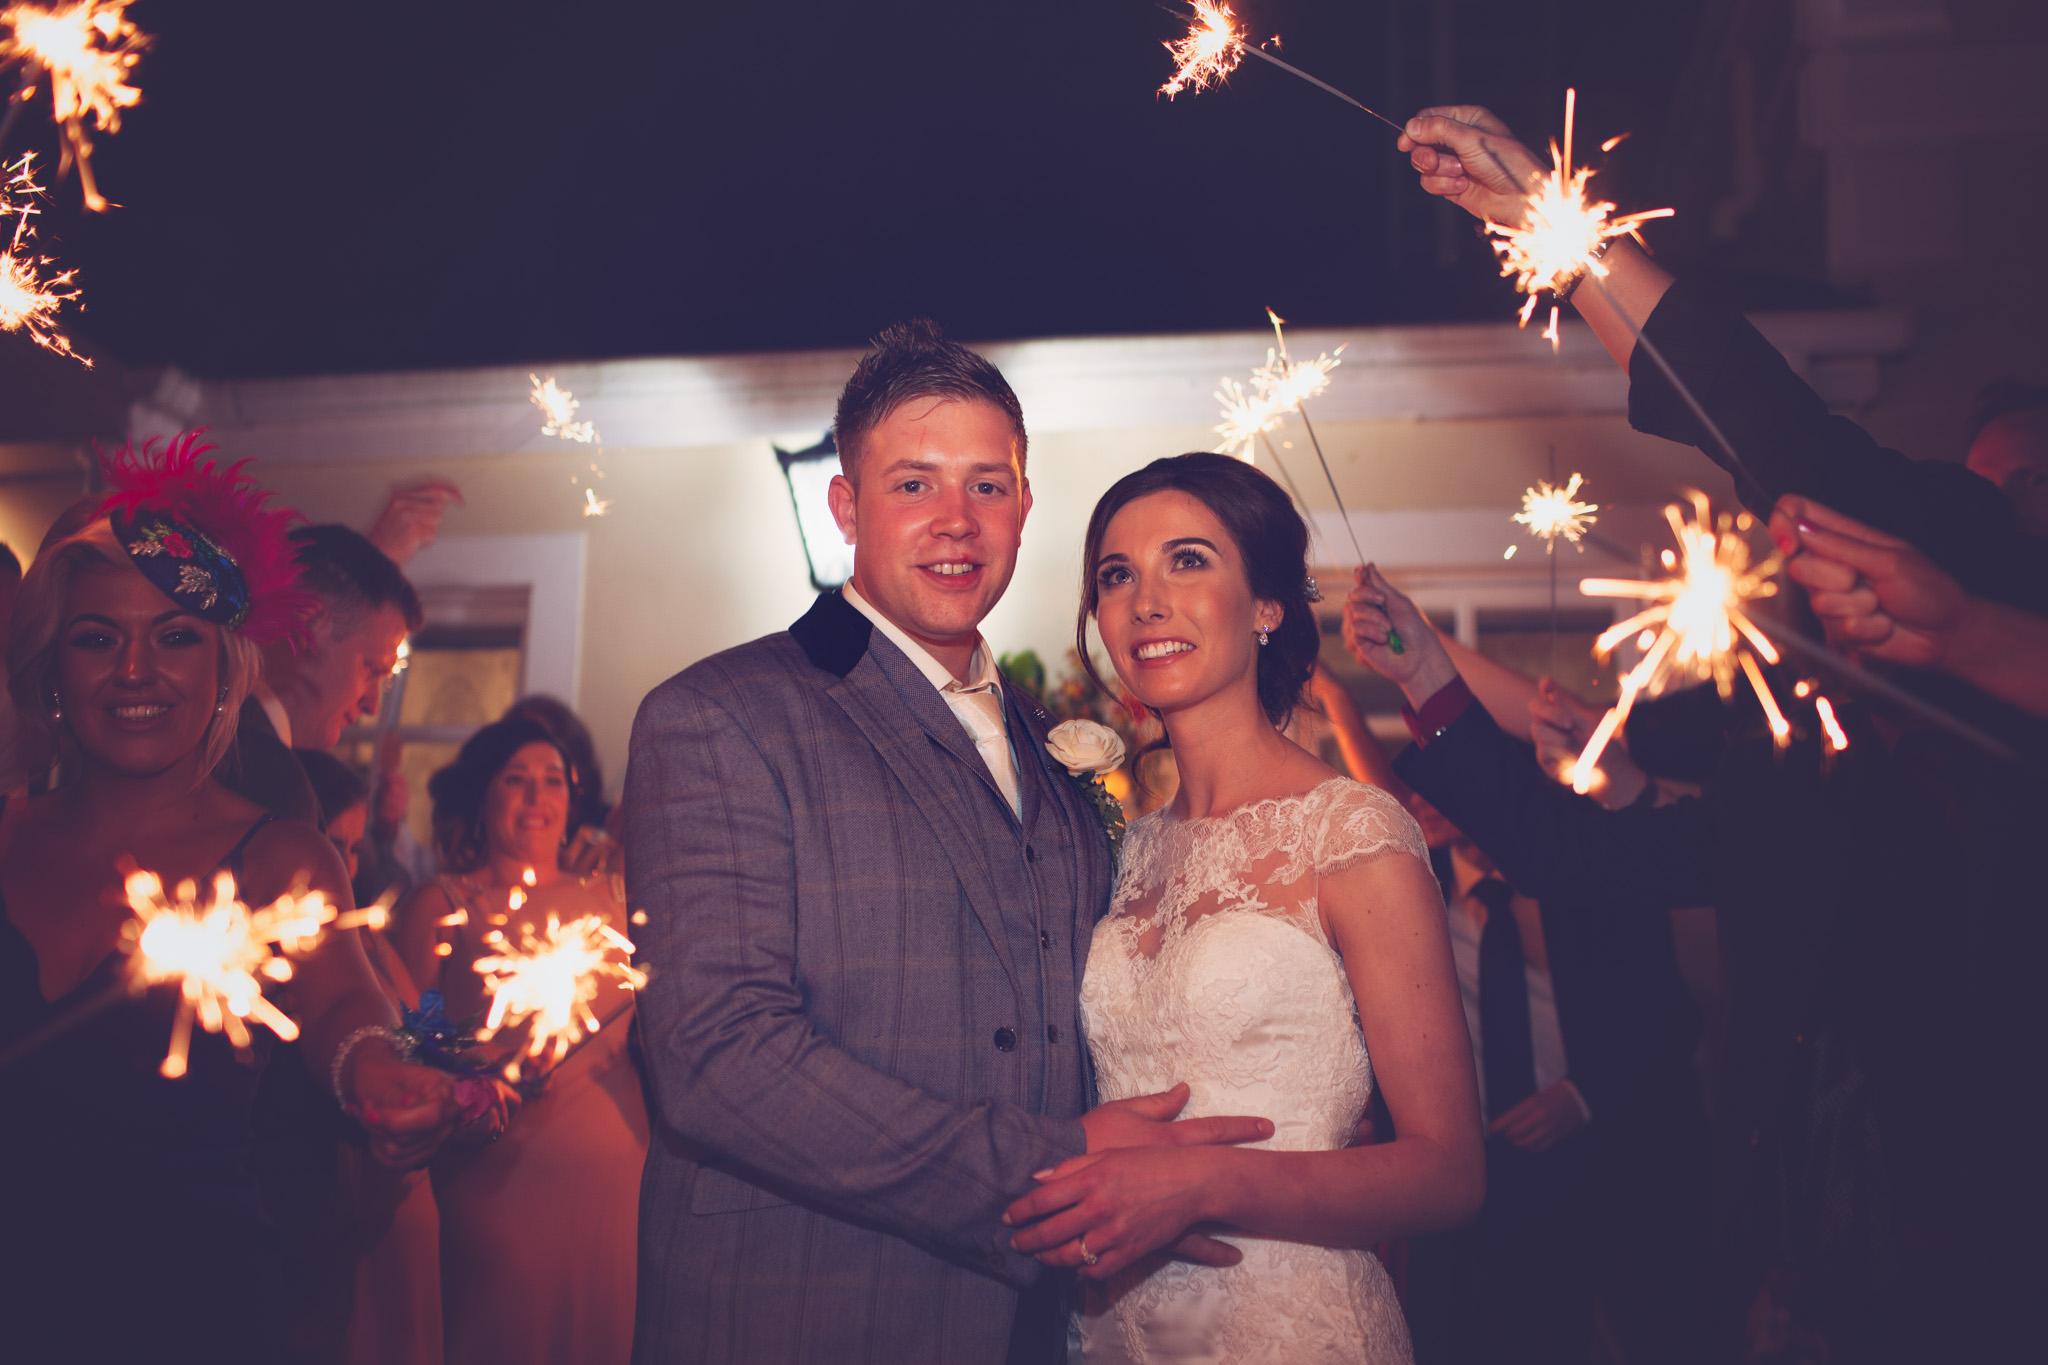 Mark_Barnes_Northern_Ireland_Wedding_Photography_Leighinmohr-house-hotel-ballymena_Wedding_Photography-73.jpg